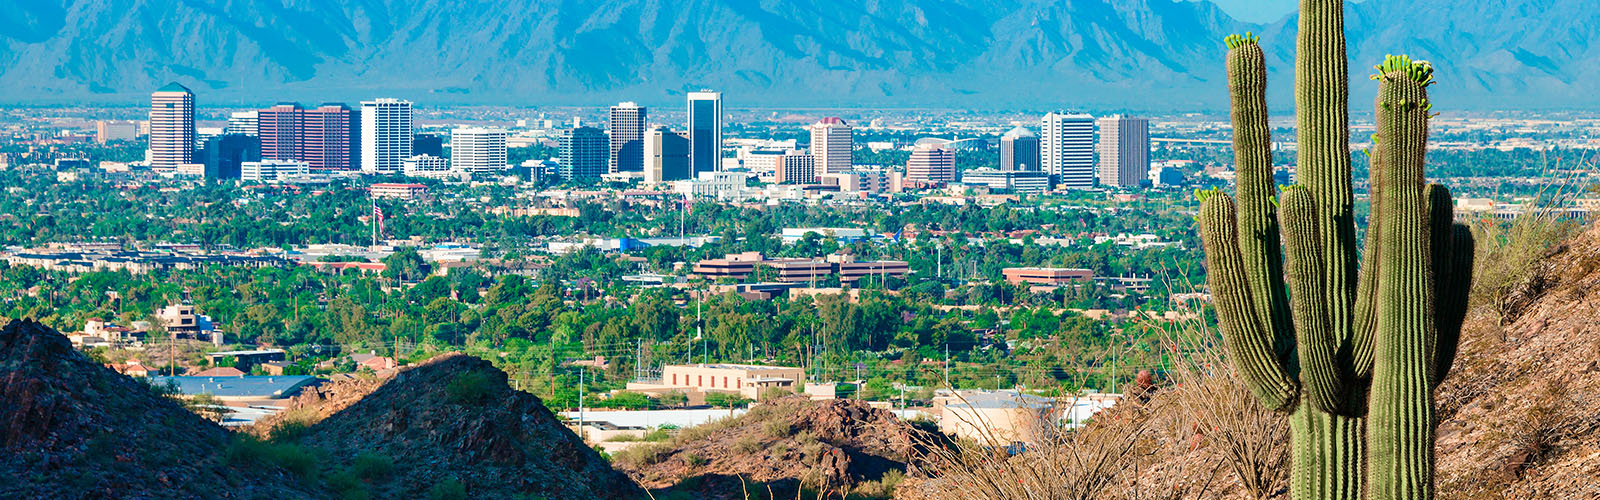 cactus and the city of Phoenix